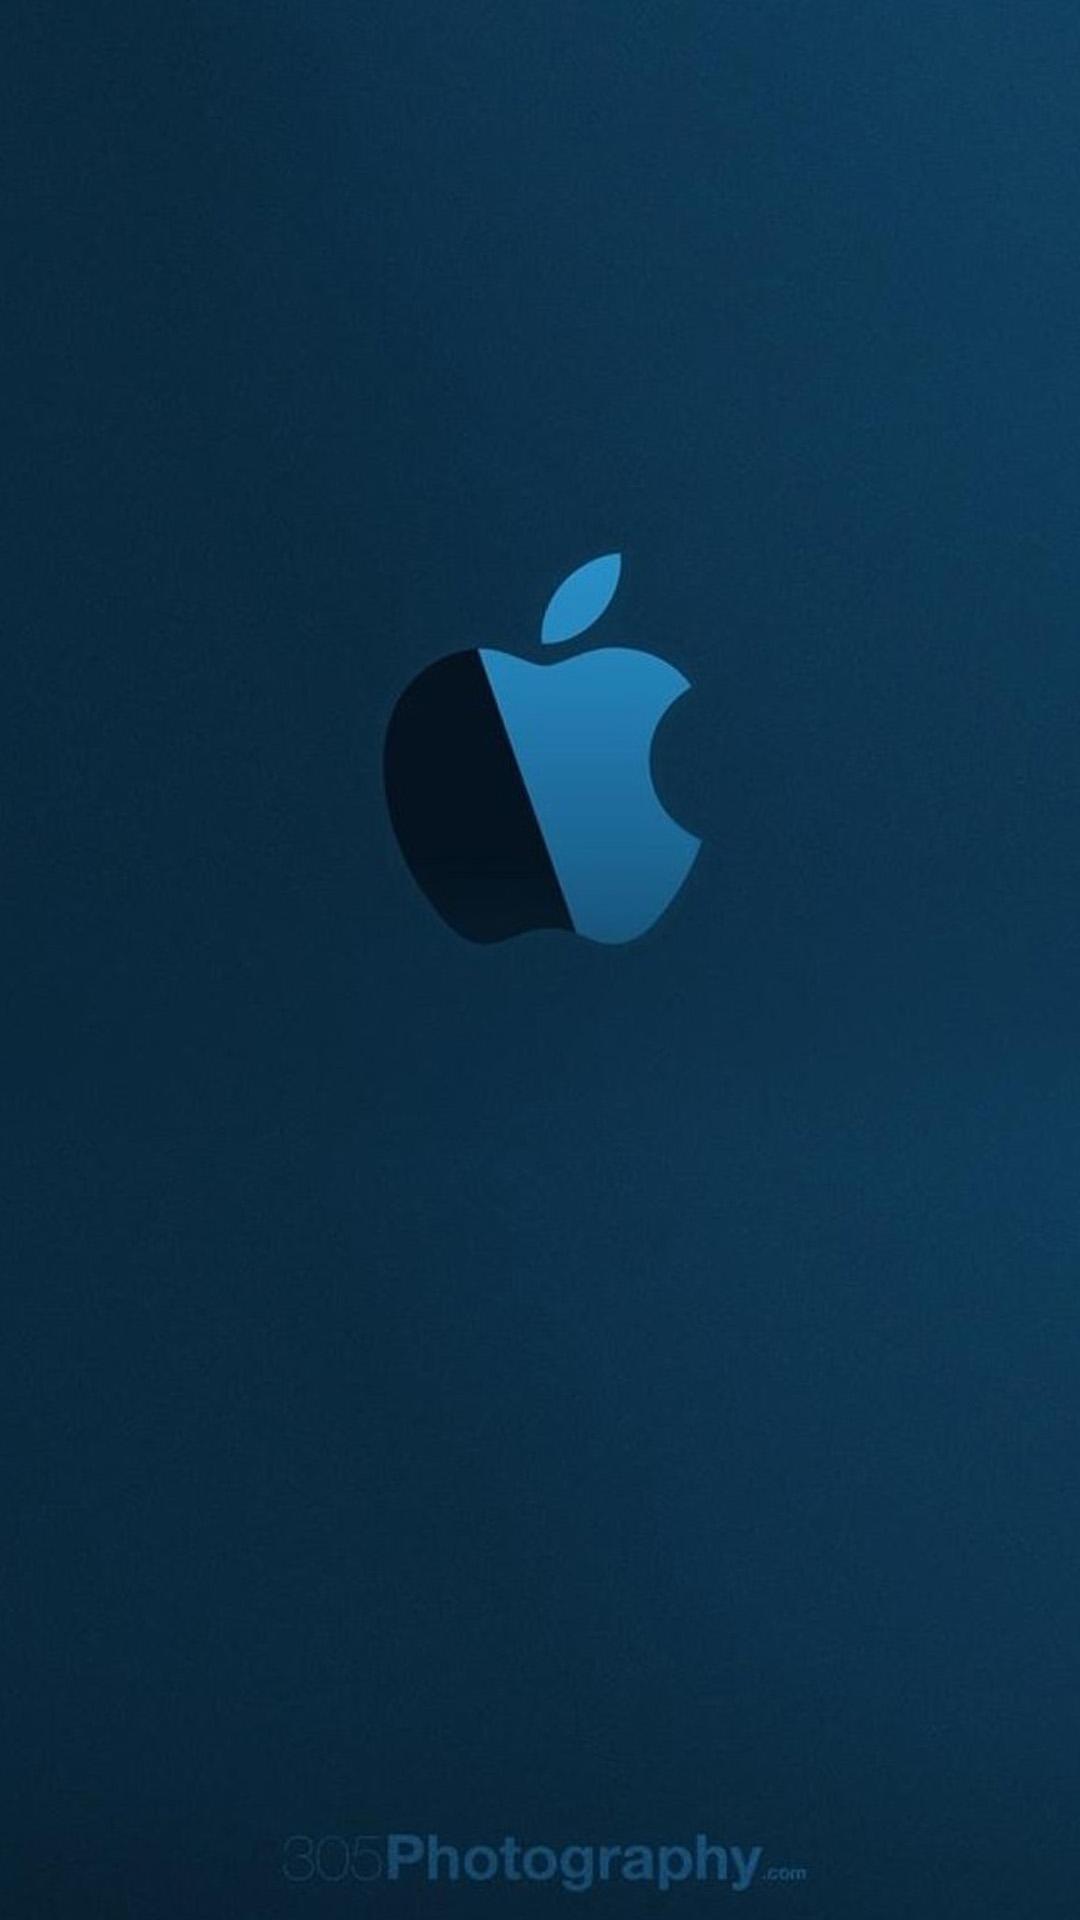 Apple Iphone 6 Plus Wallpaper 80 - Apple Logo Wallpaper Iphone 7 Plus , HD Wallpaper & Backgrounds